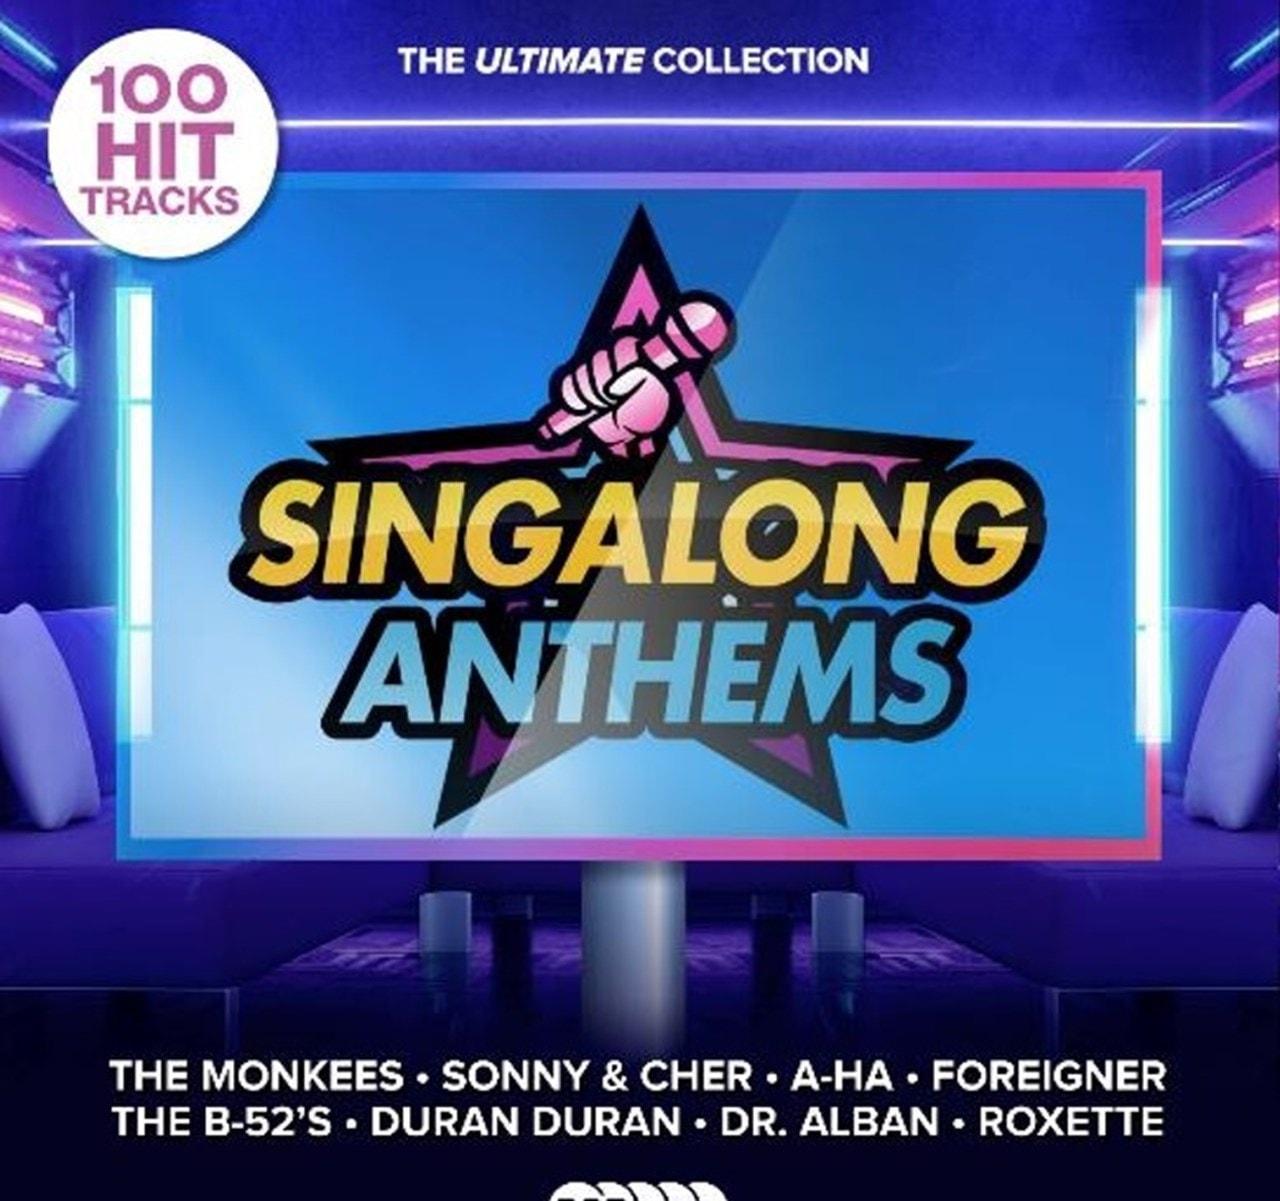 Ultimate Singalong Anthems/car-a-oke - 1